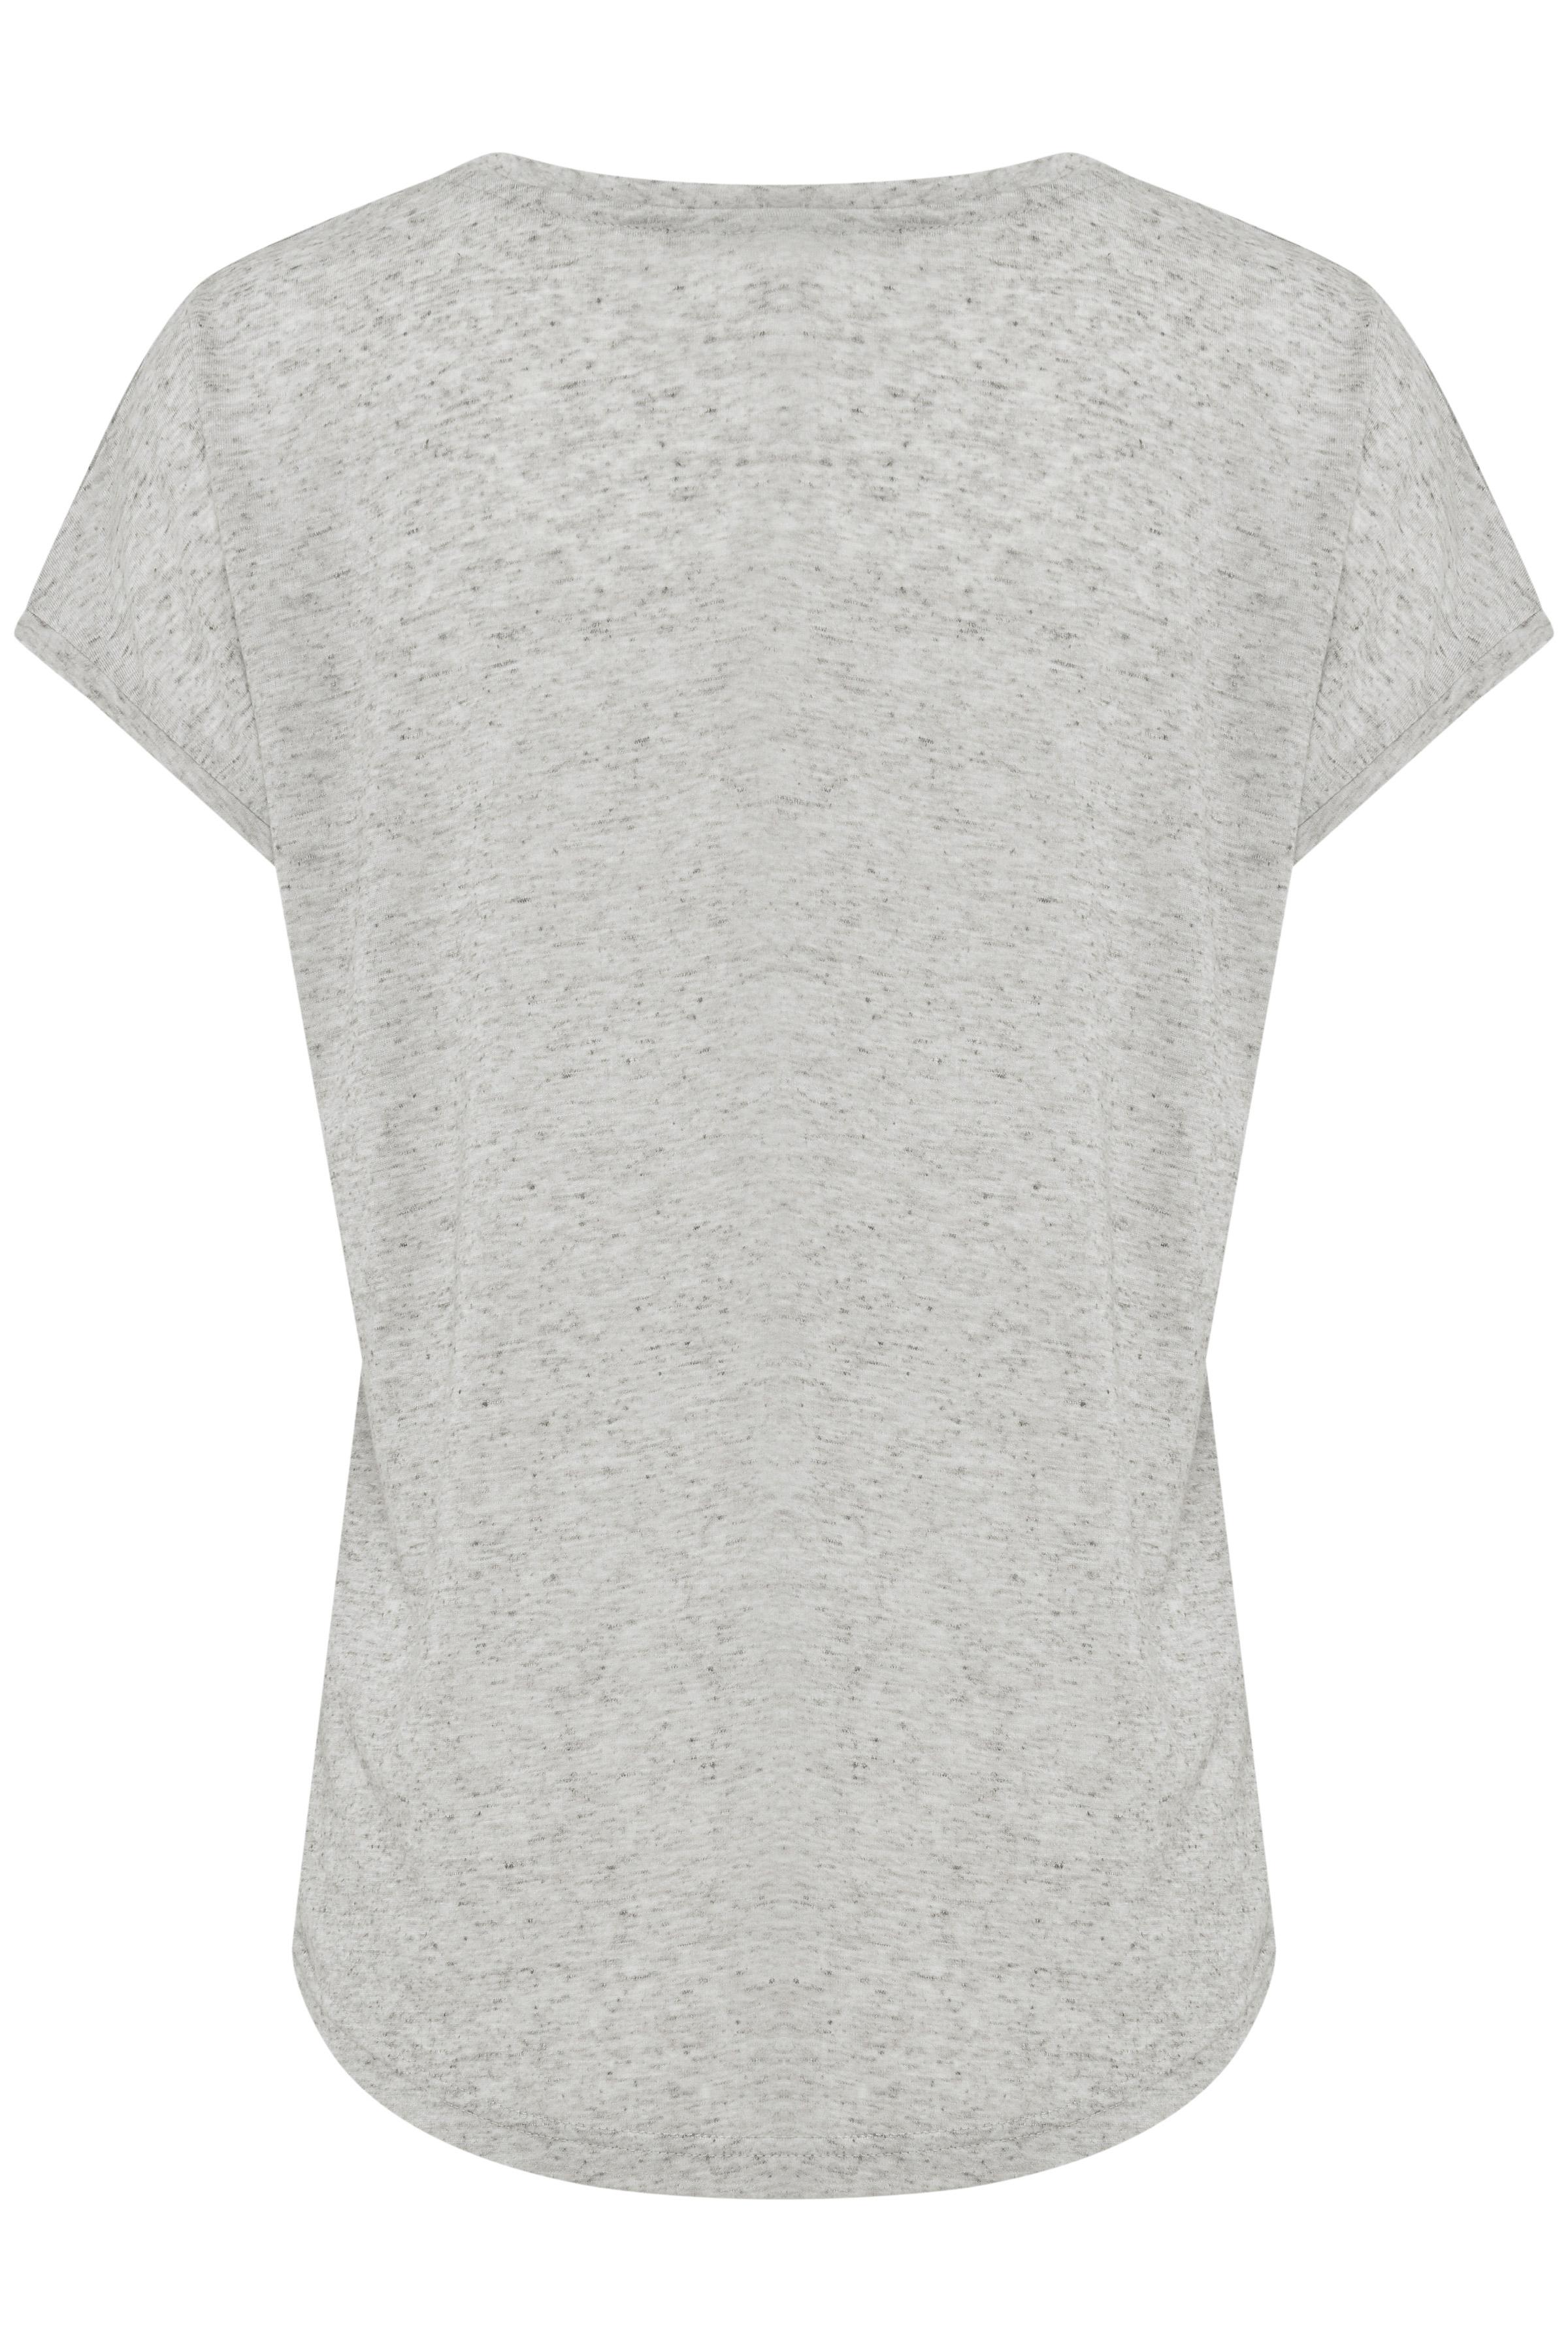 Lys gråmeleret Kortærmet T-shirt fra b.young – Køb Lys gråmeleret Kortærmet T-shirt fra str. XS-XXL her